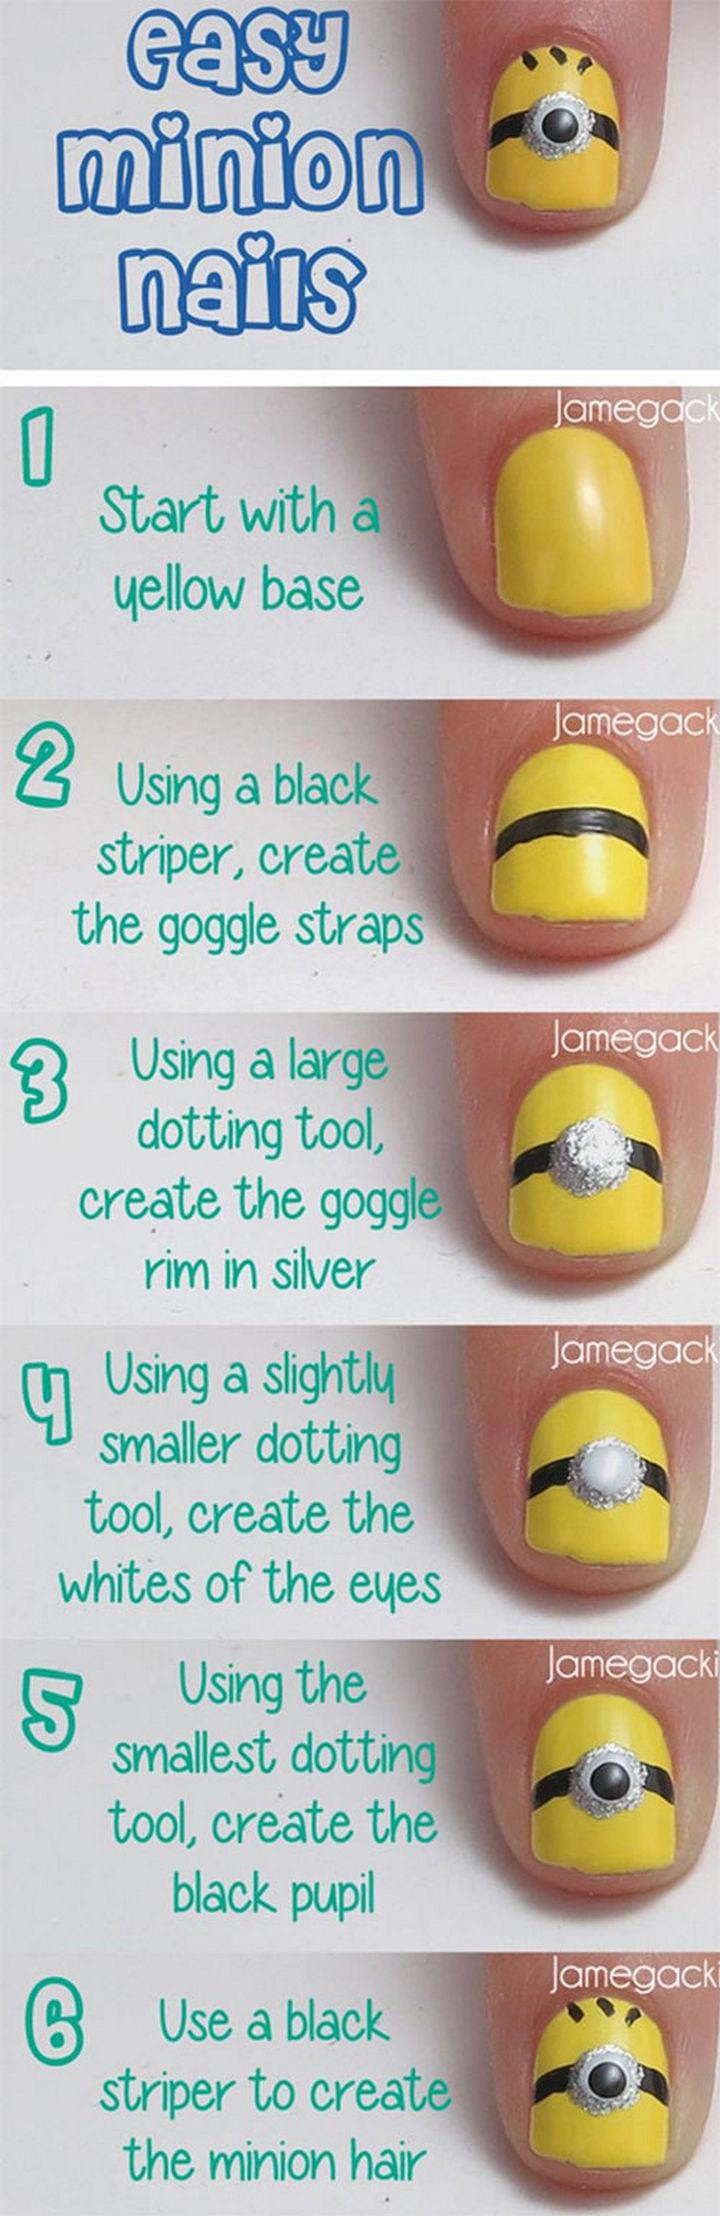 19 Minion Nails - Easy DIY Minion nails!